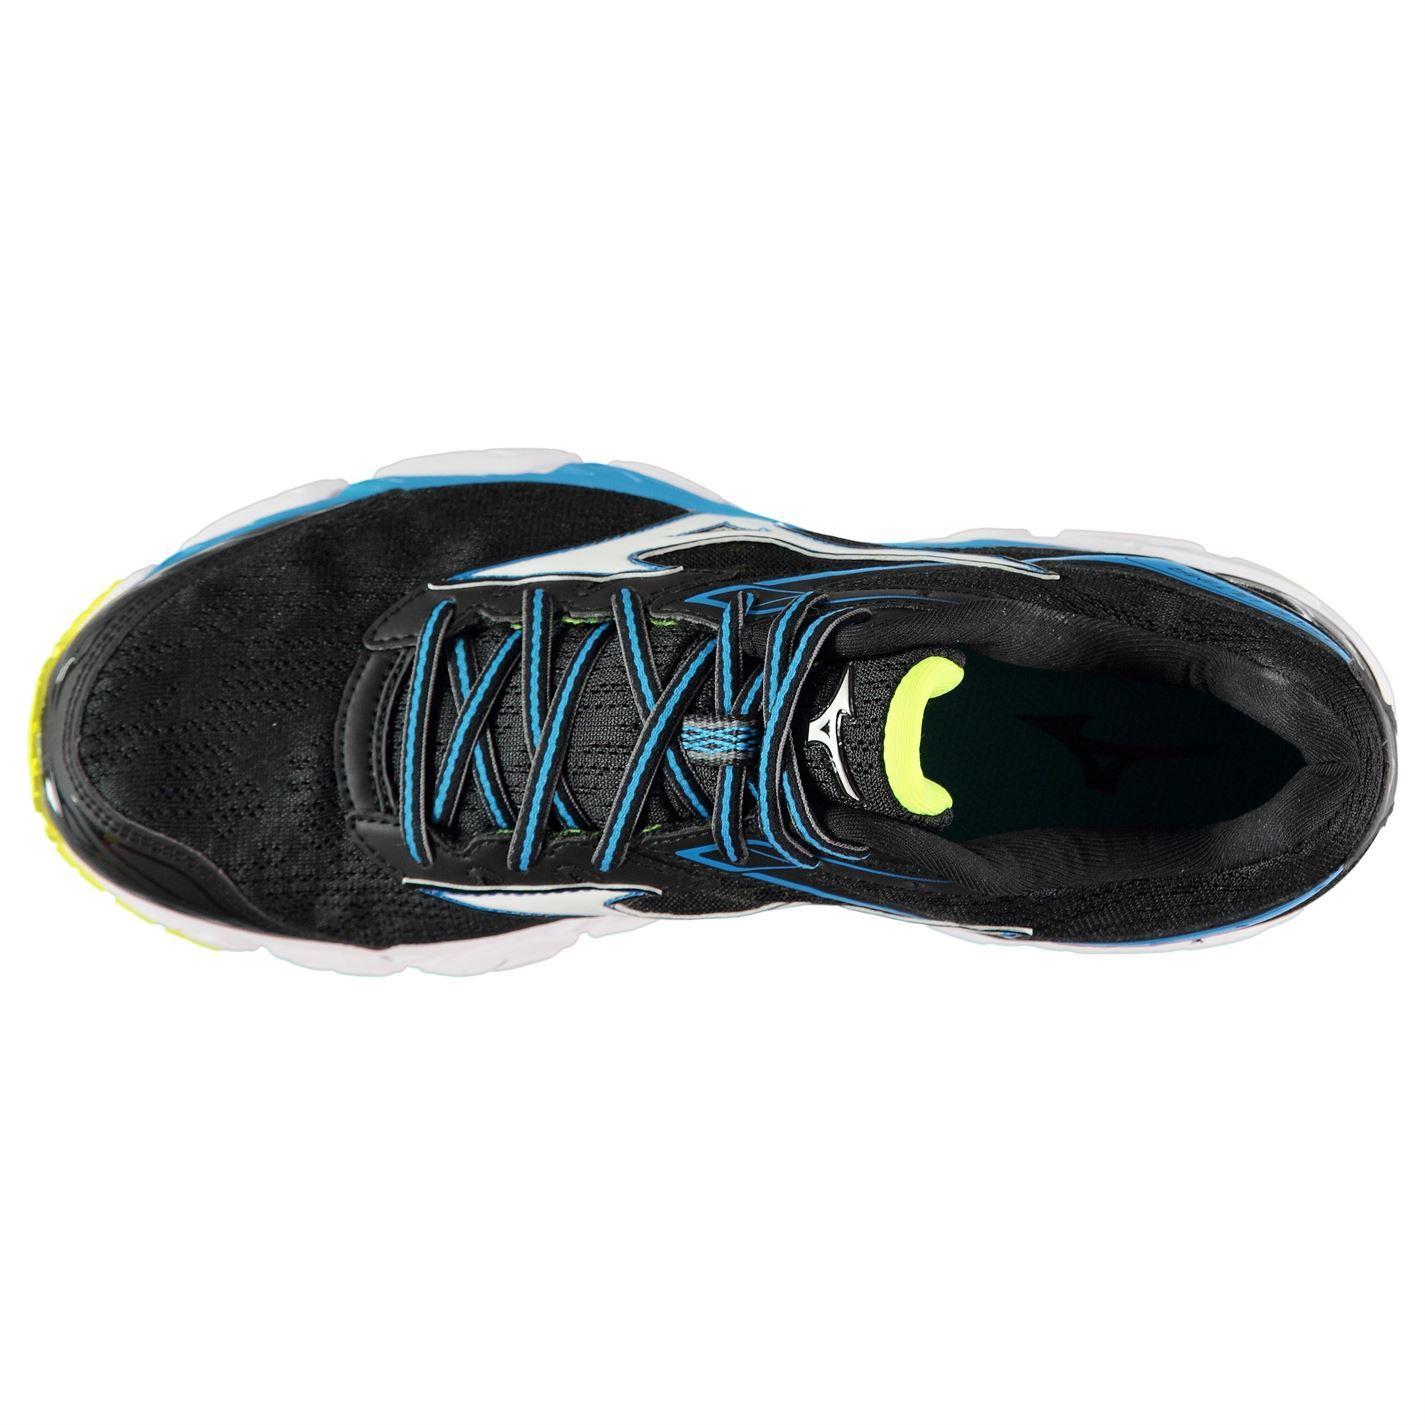 Mens Jogging 9 Running Mizuno Shoes Blackwhtblue Ultima Wave t0RwxX